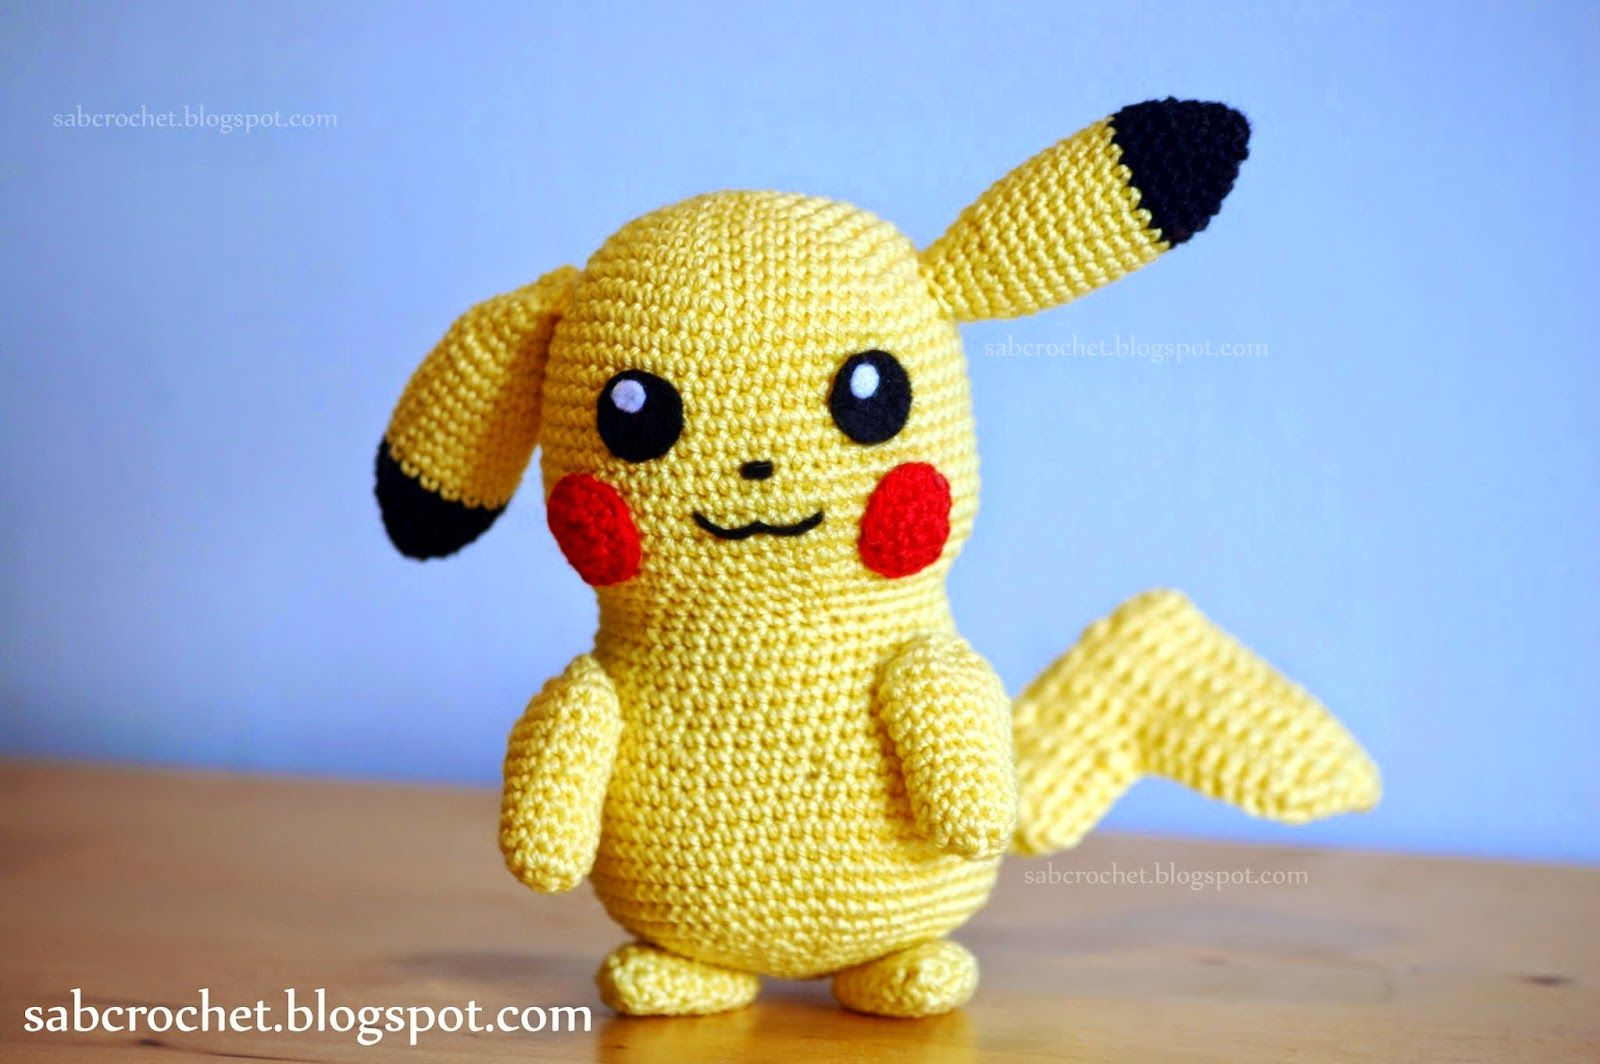 Free crochet pattern Pikachu (Pokemon) | Patrón gratis, Lentillas y ...